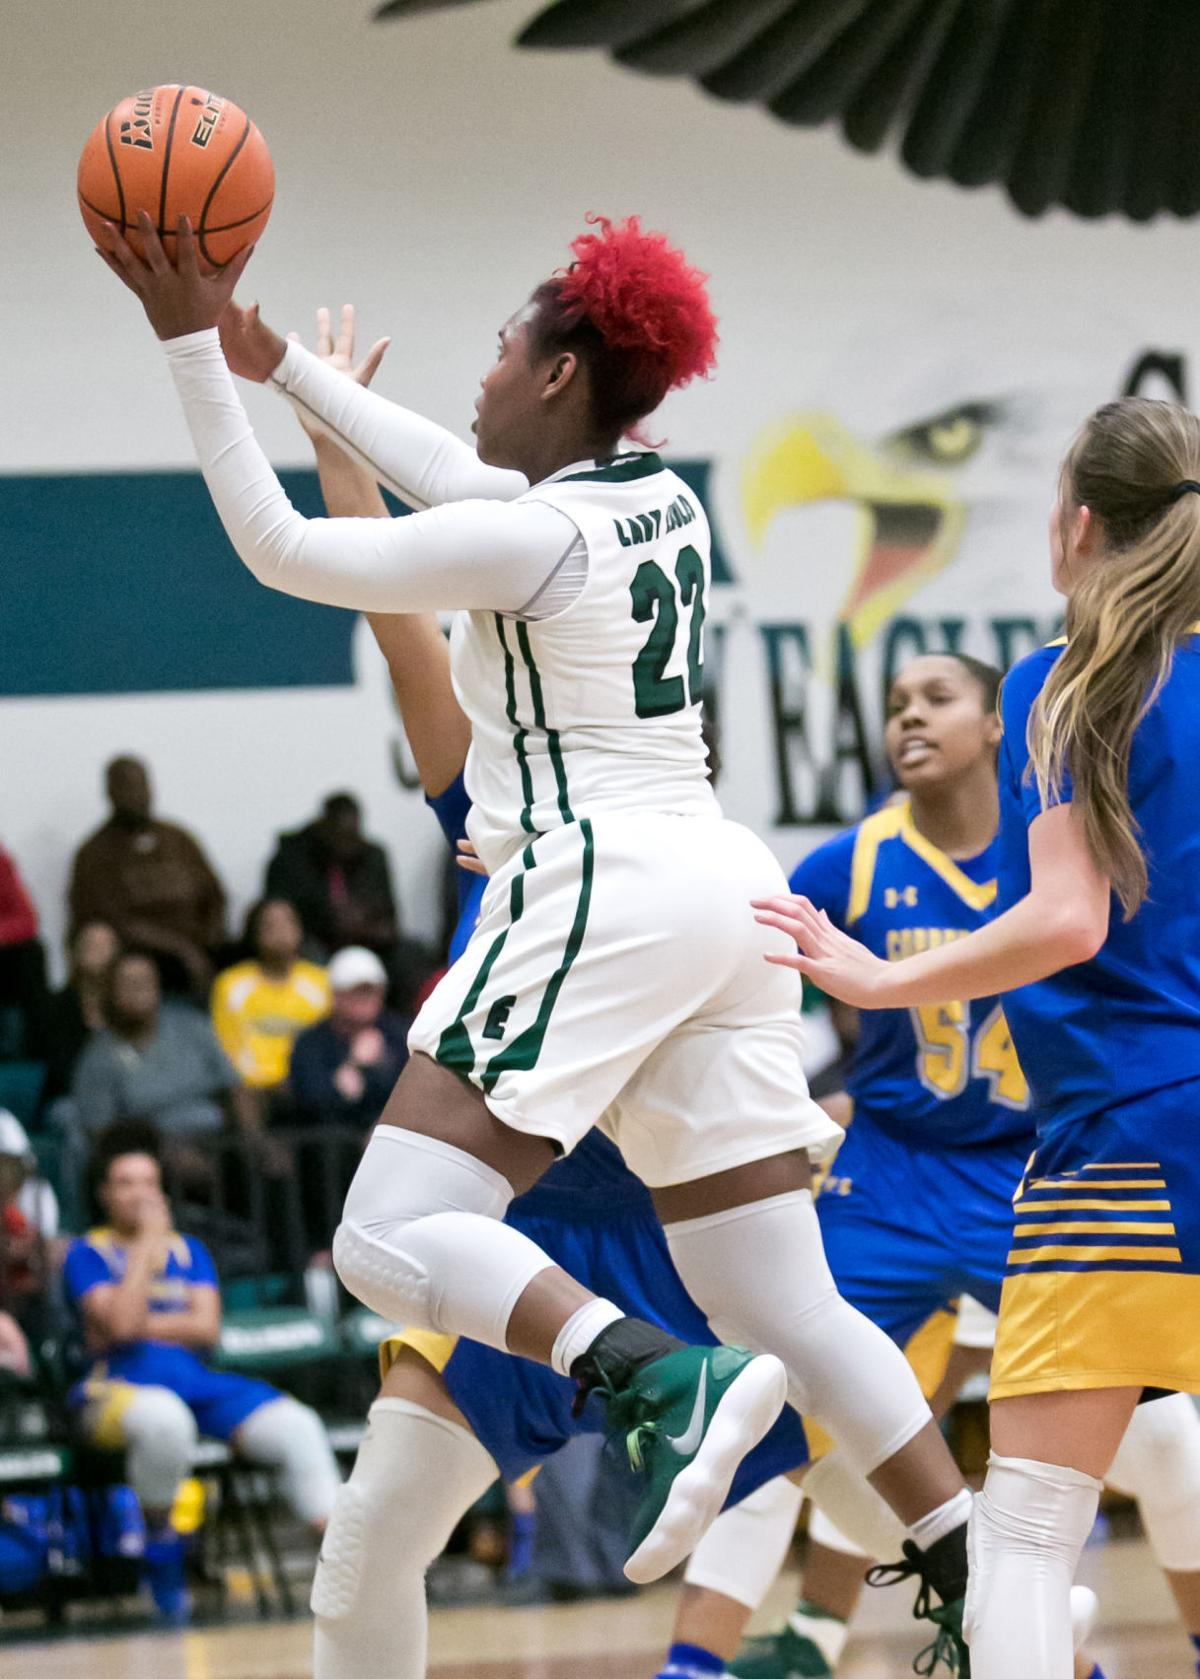 Copperas Cove @ Ellison Girls Basketball